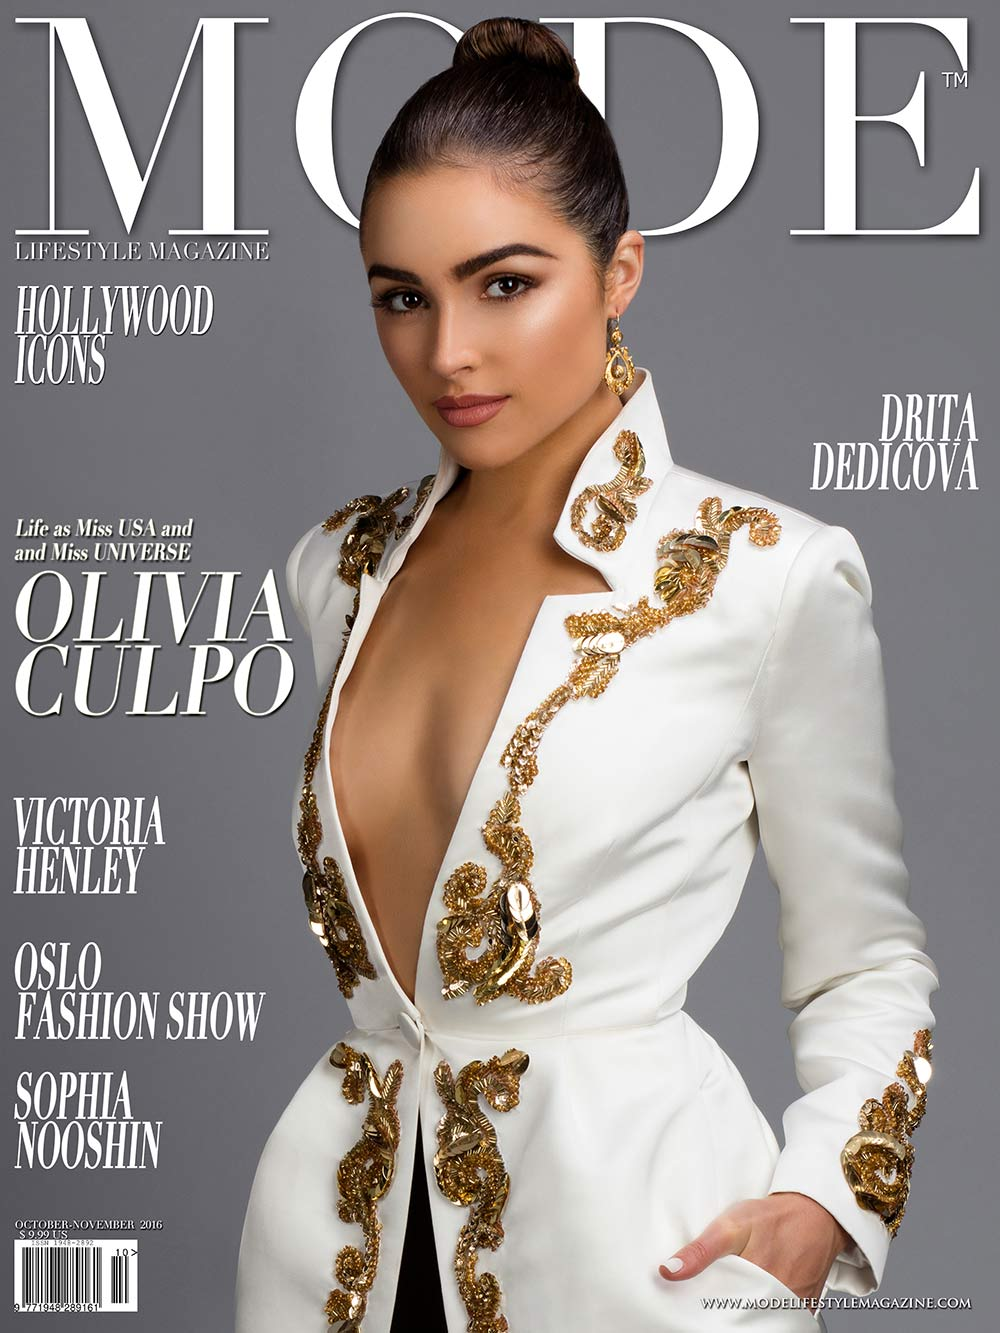 Olivia Culpo on Cover of Mode Lifestyle Magazine